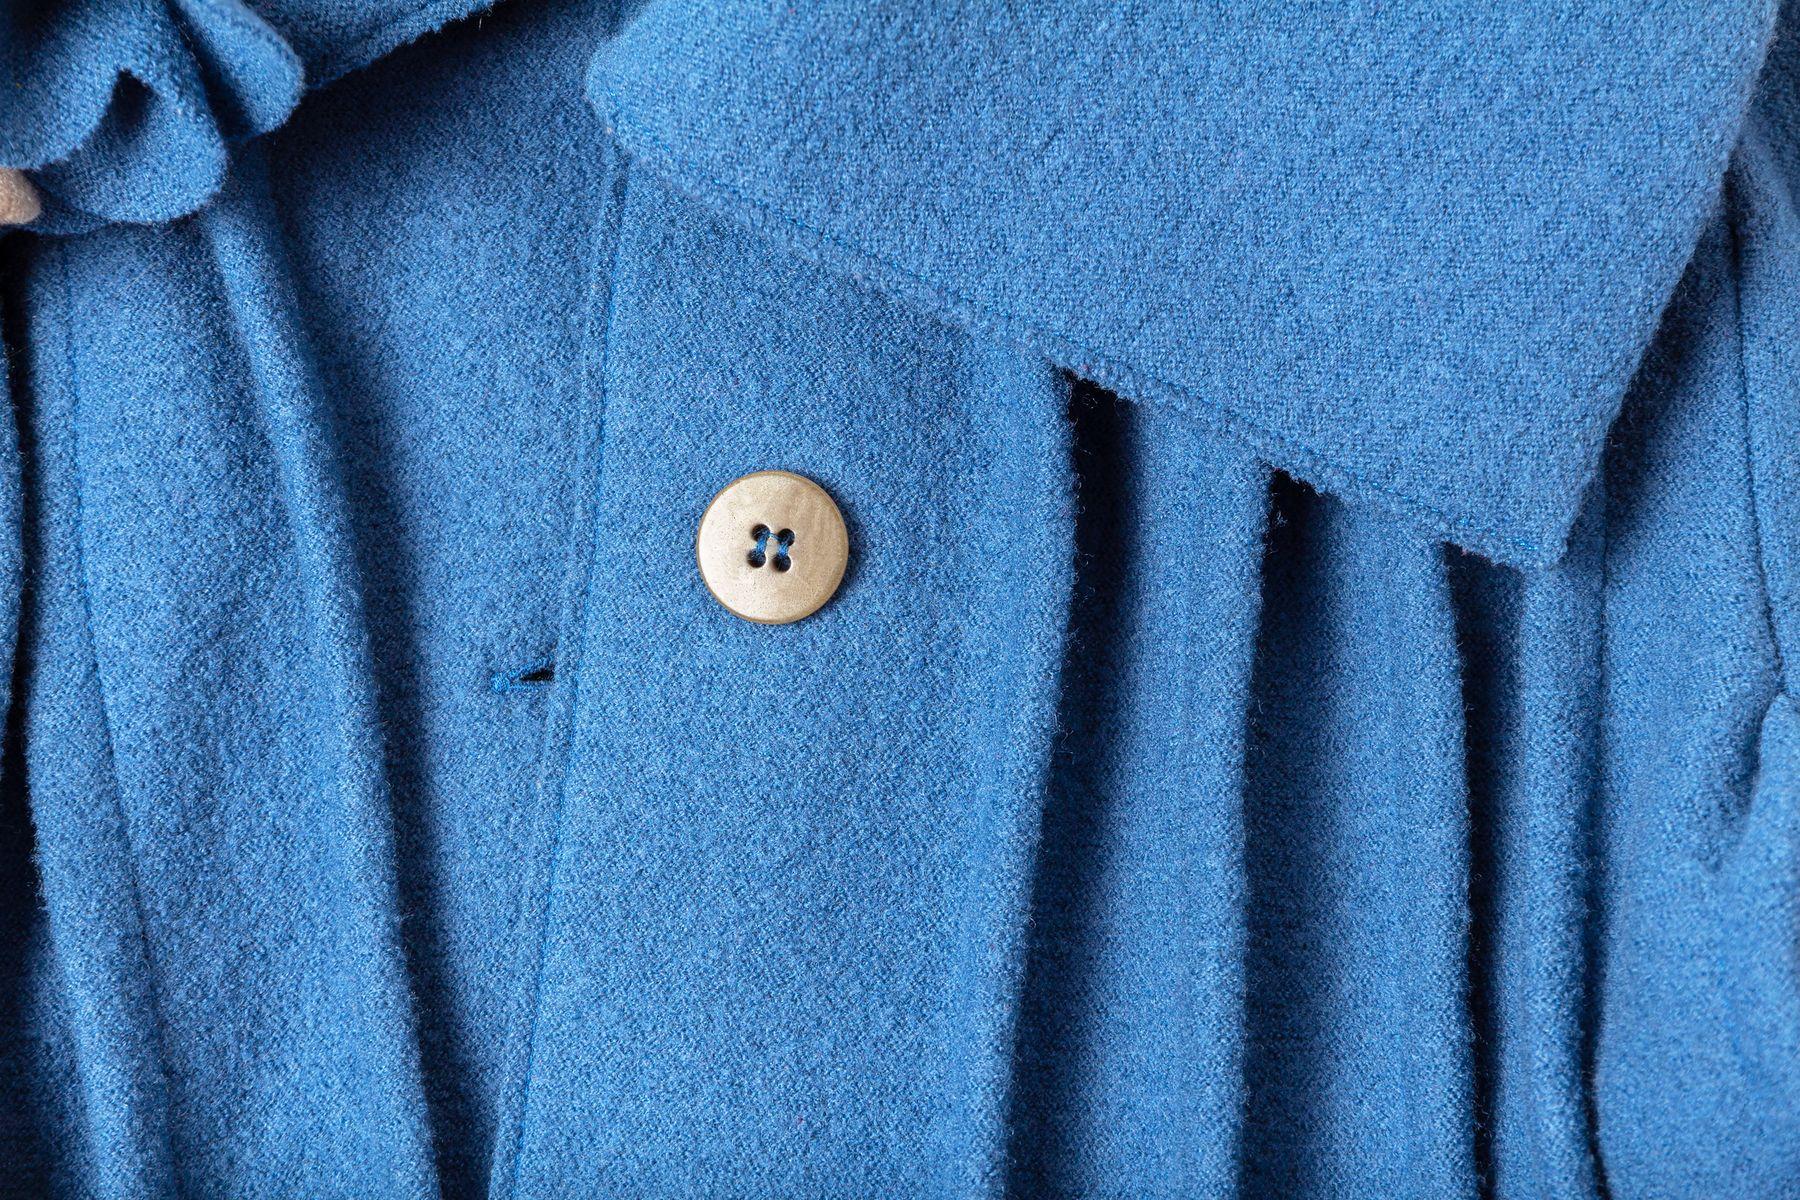 A closeup of a blue woollen coat